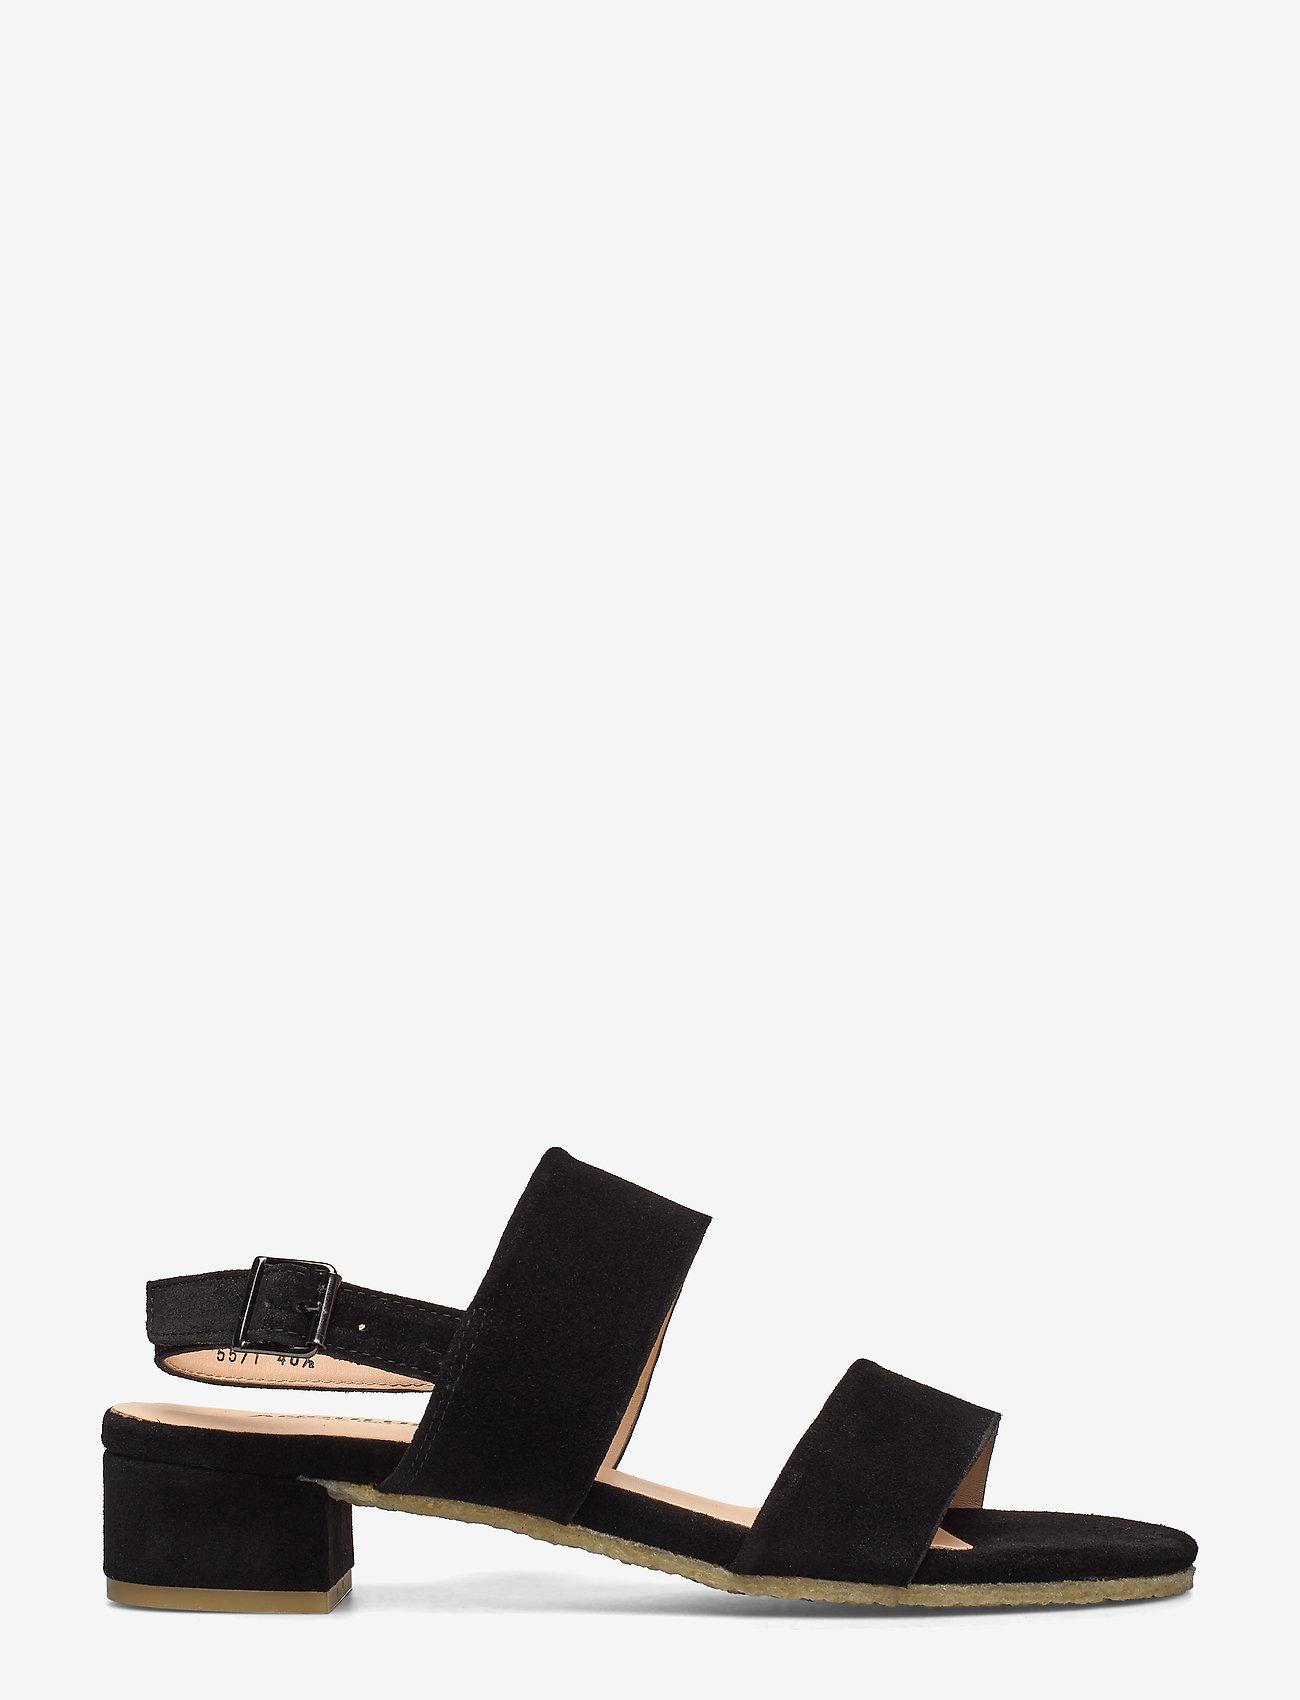 ANGULUS - Sandals - flat - sandalen met hak - 1163 black - 1